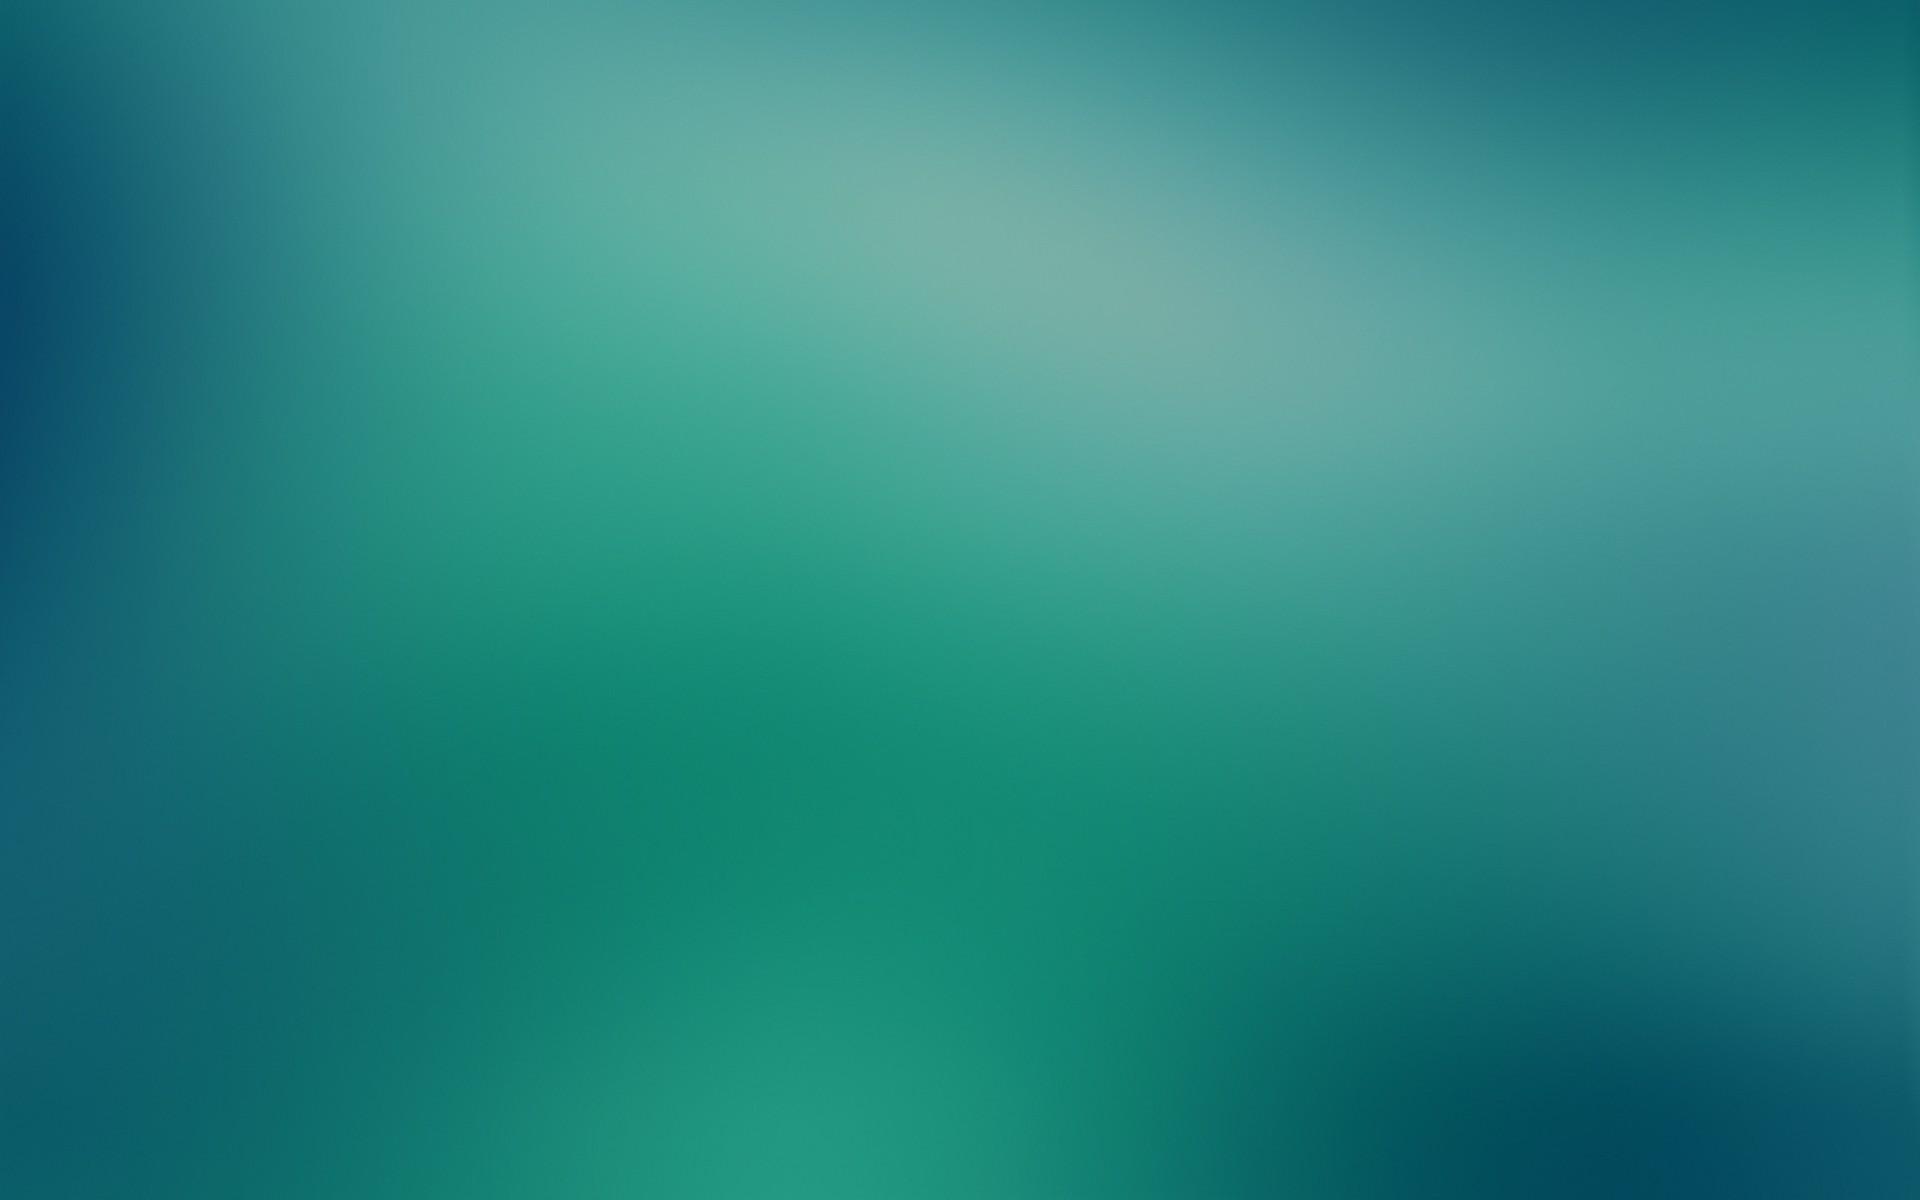 fond d 39 cran minimalisme ouvrages d 39 art vert bleu simple cercle reflet vague ligne. Black Bedroom Furniture Sets. Home Design Ideas